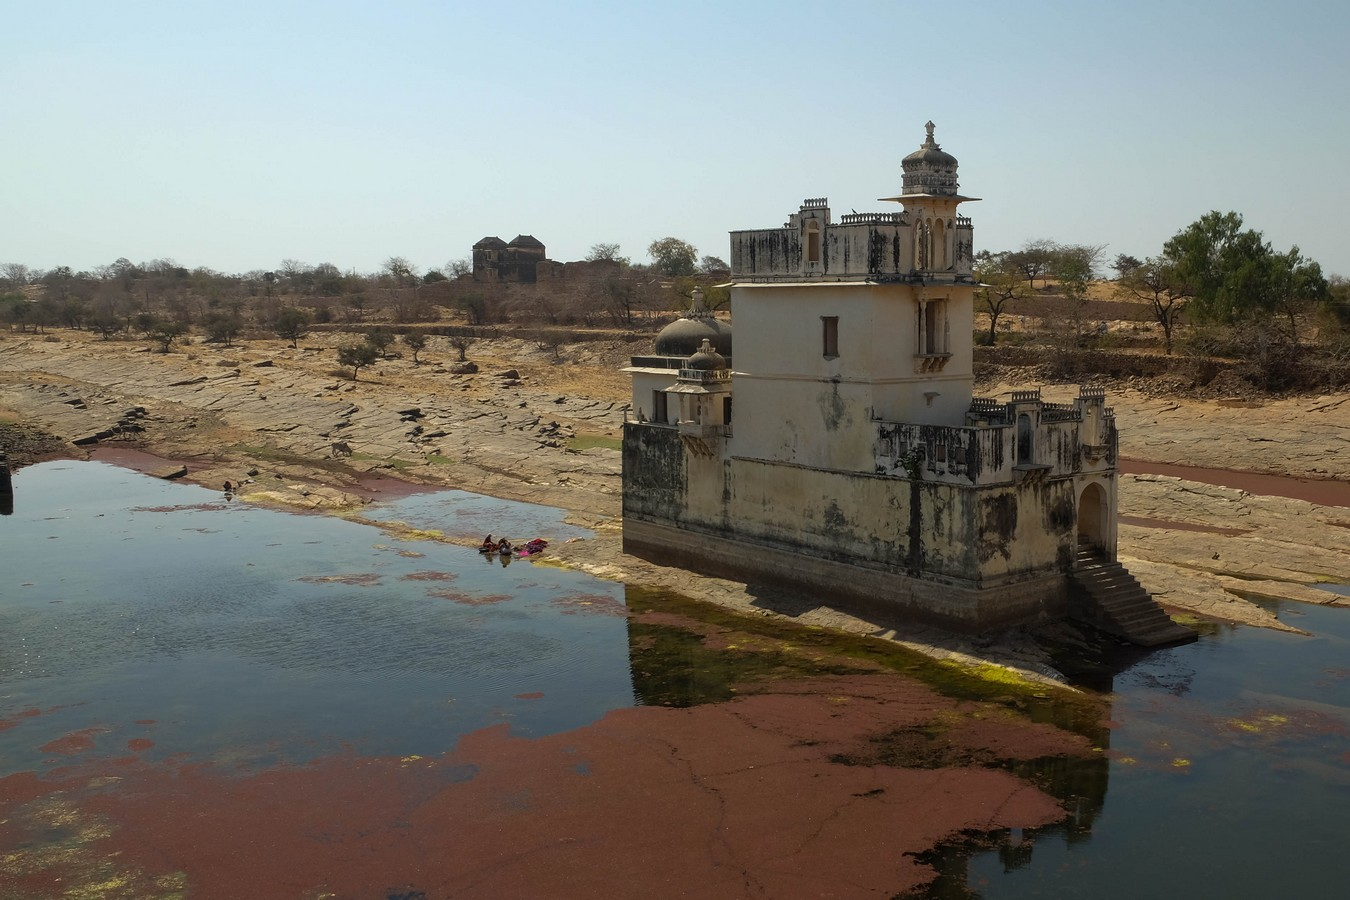 Le pavillon Padmini haveli à Chittorgarh